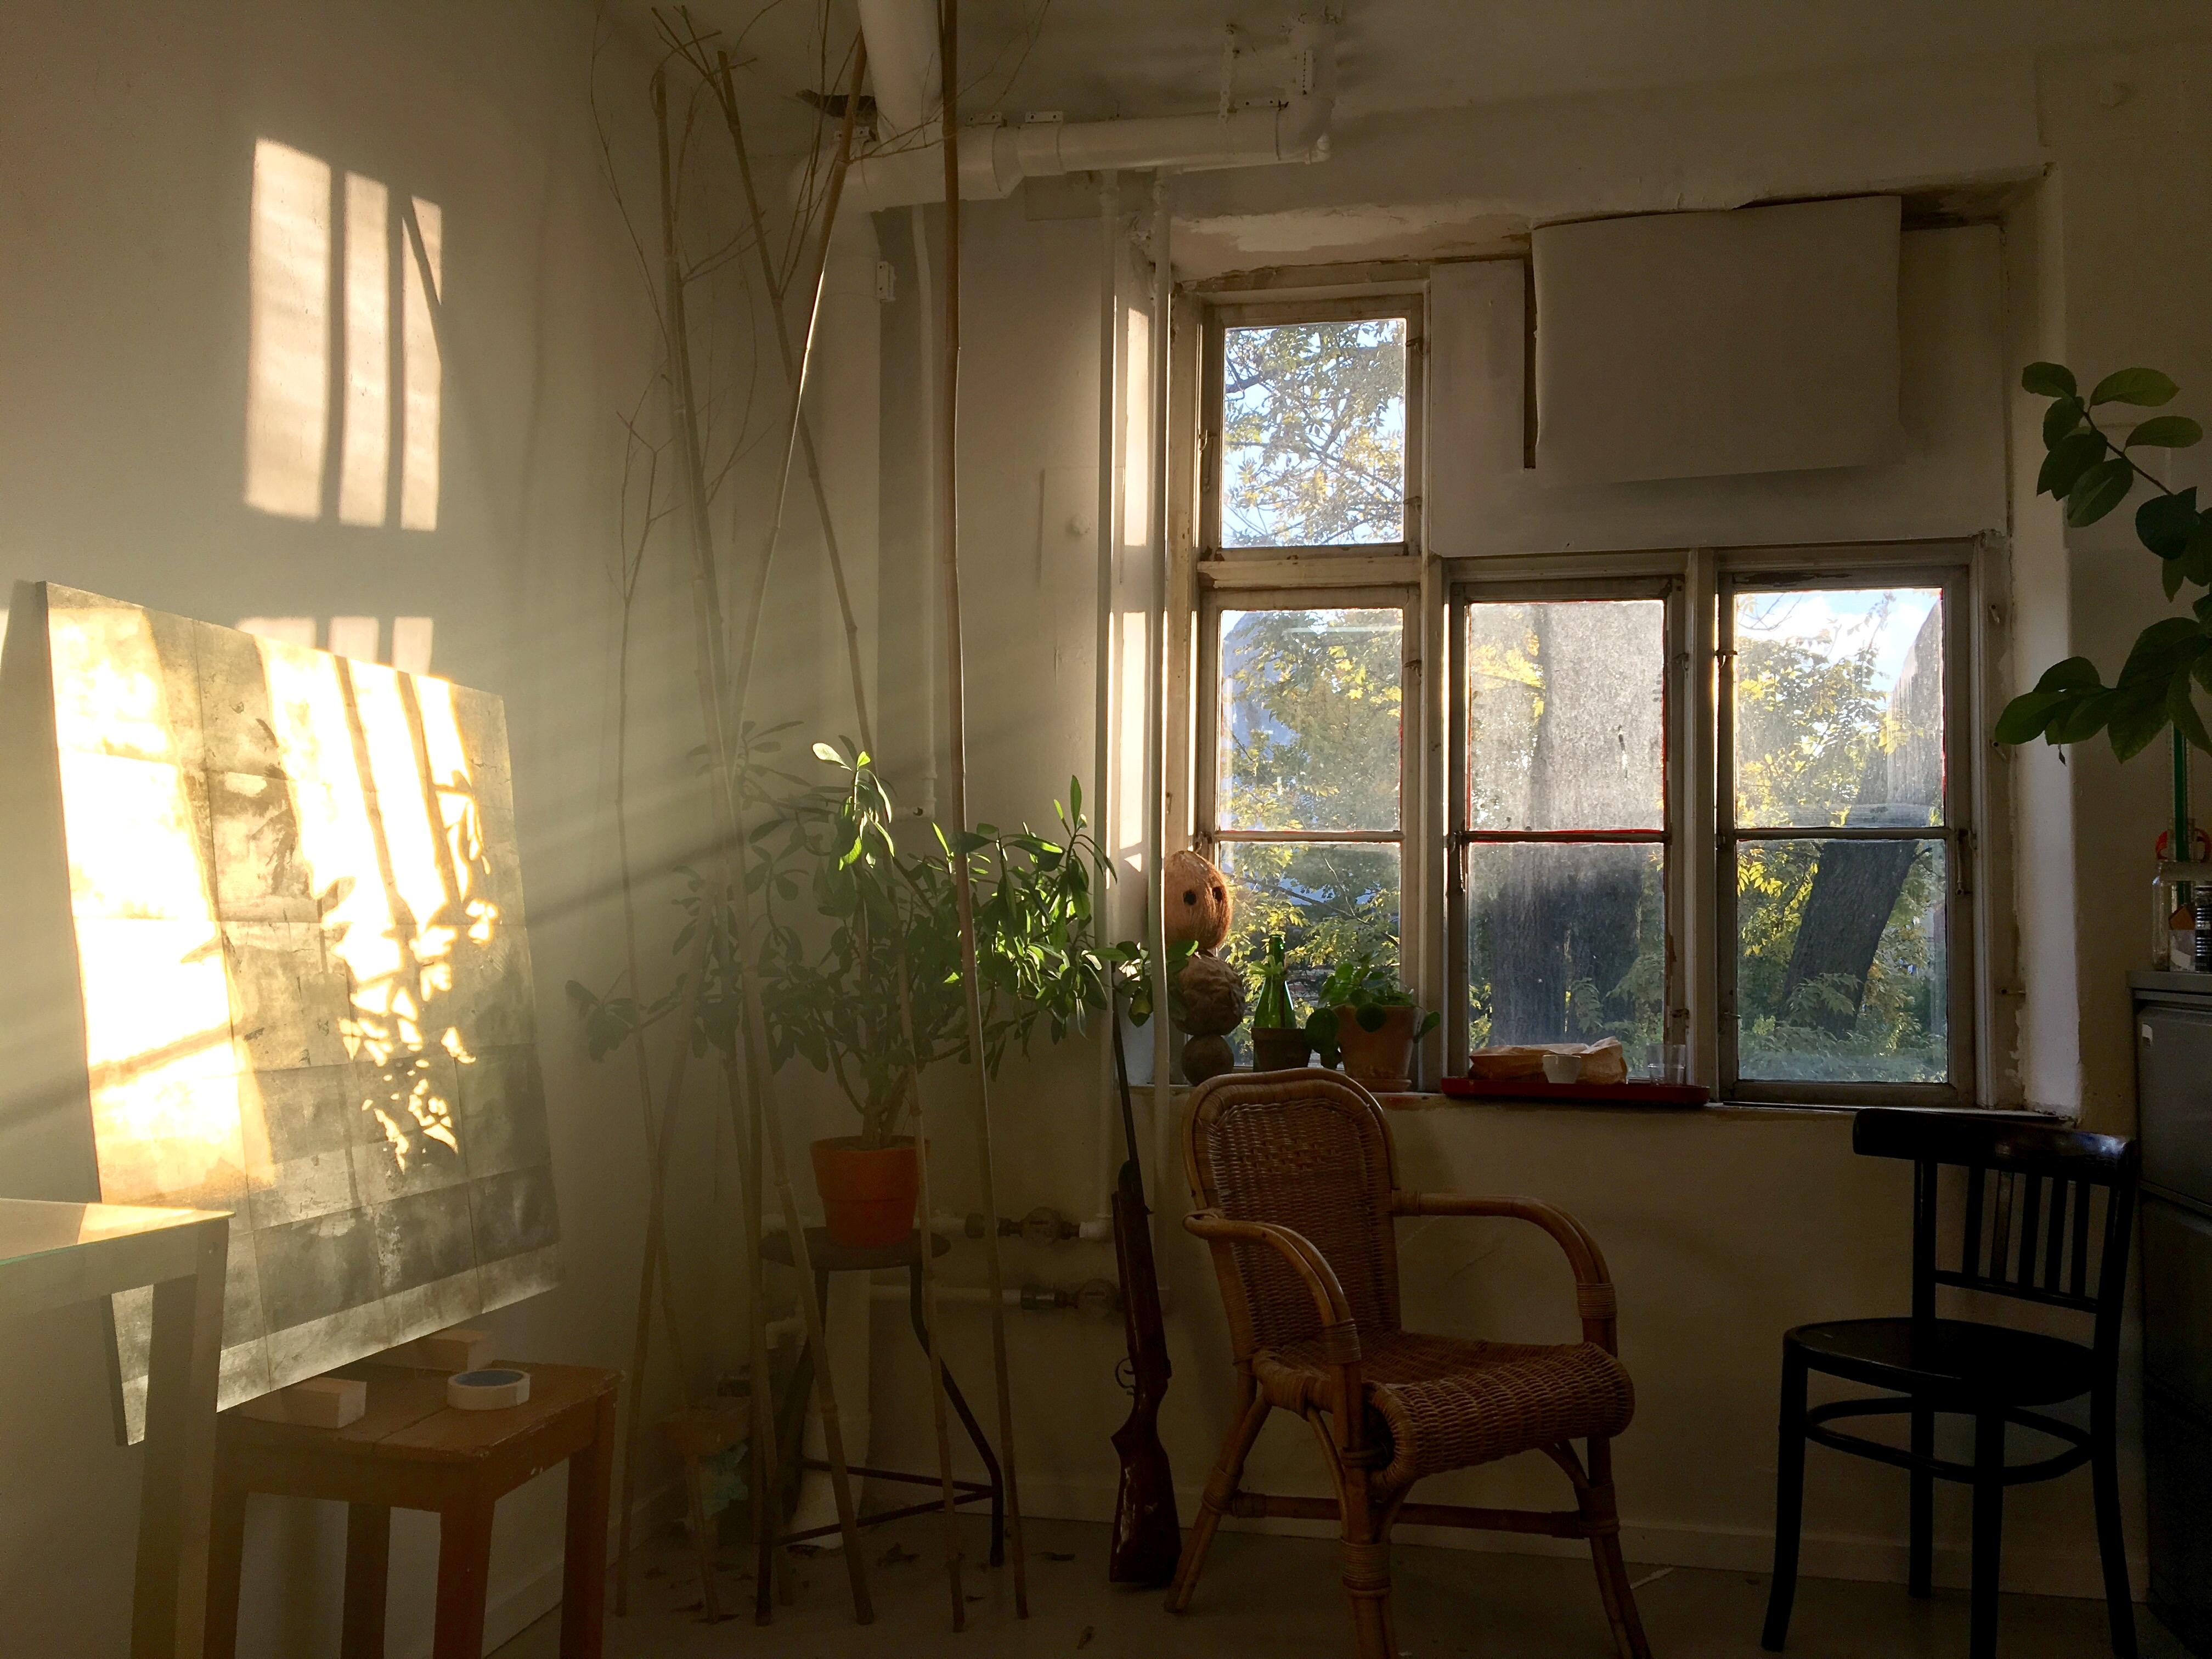 albert-grondahl-studio